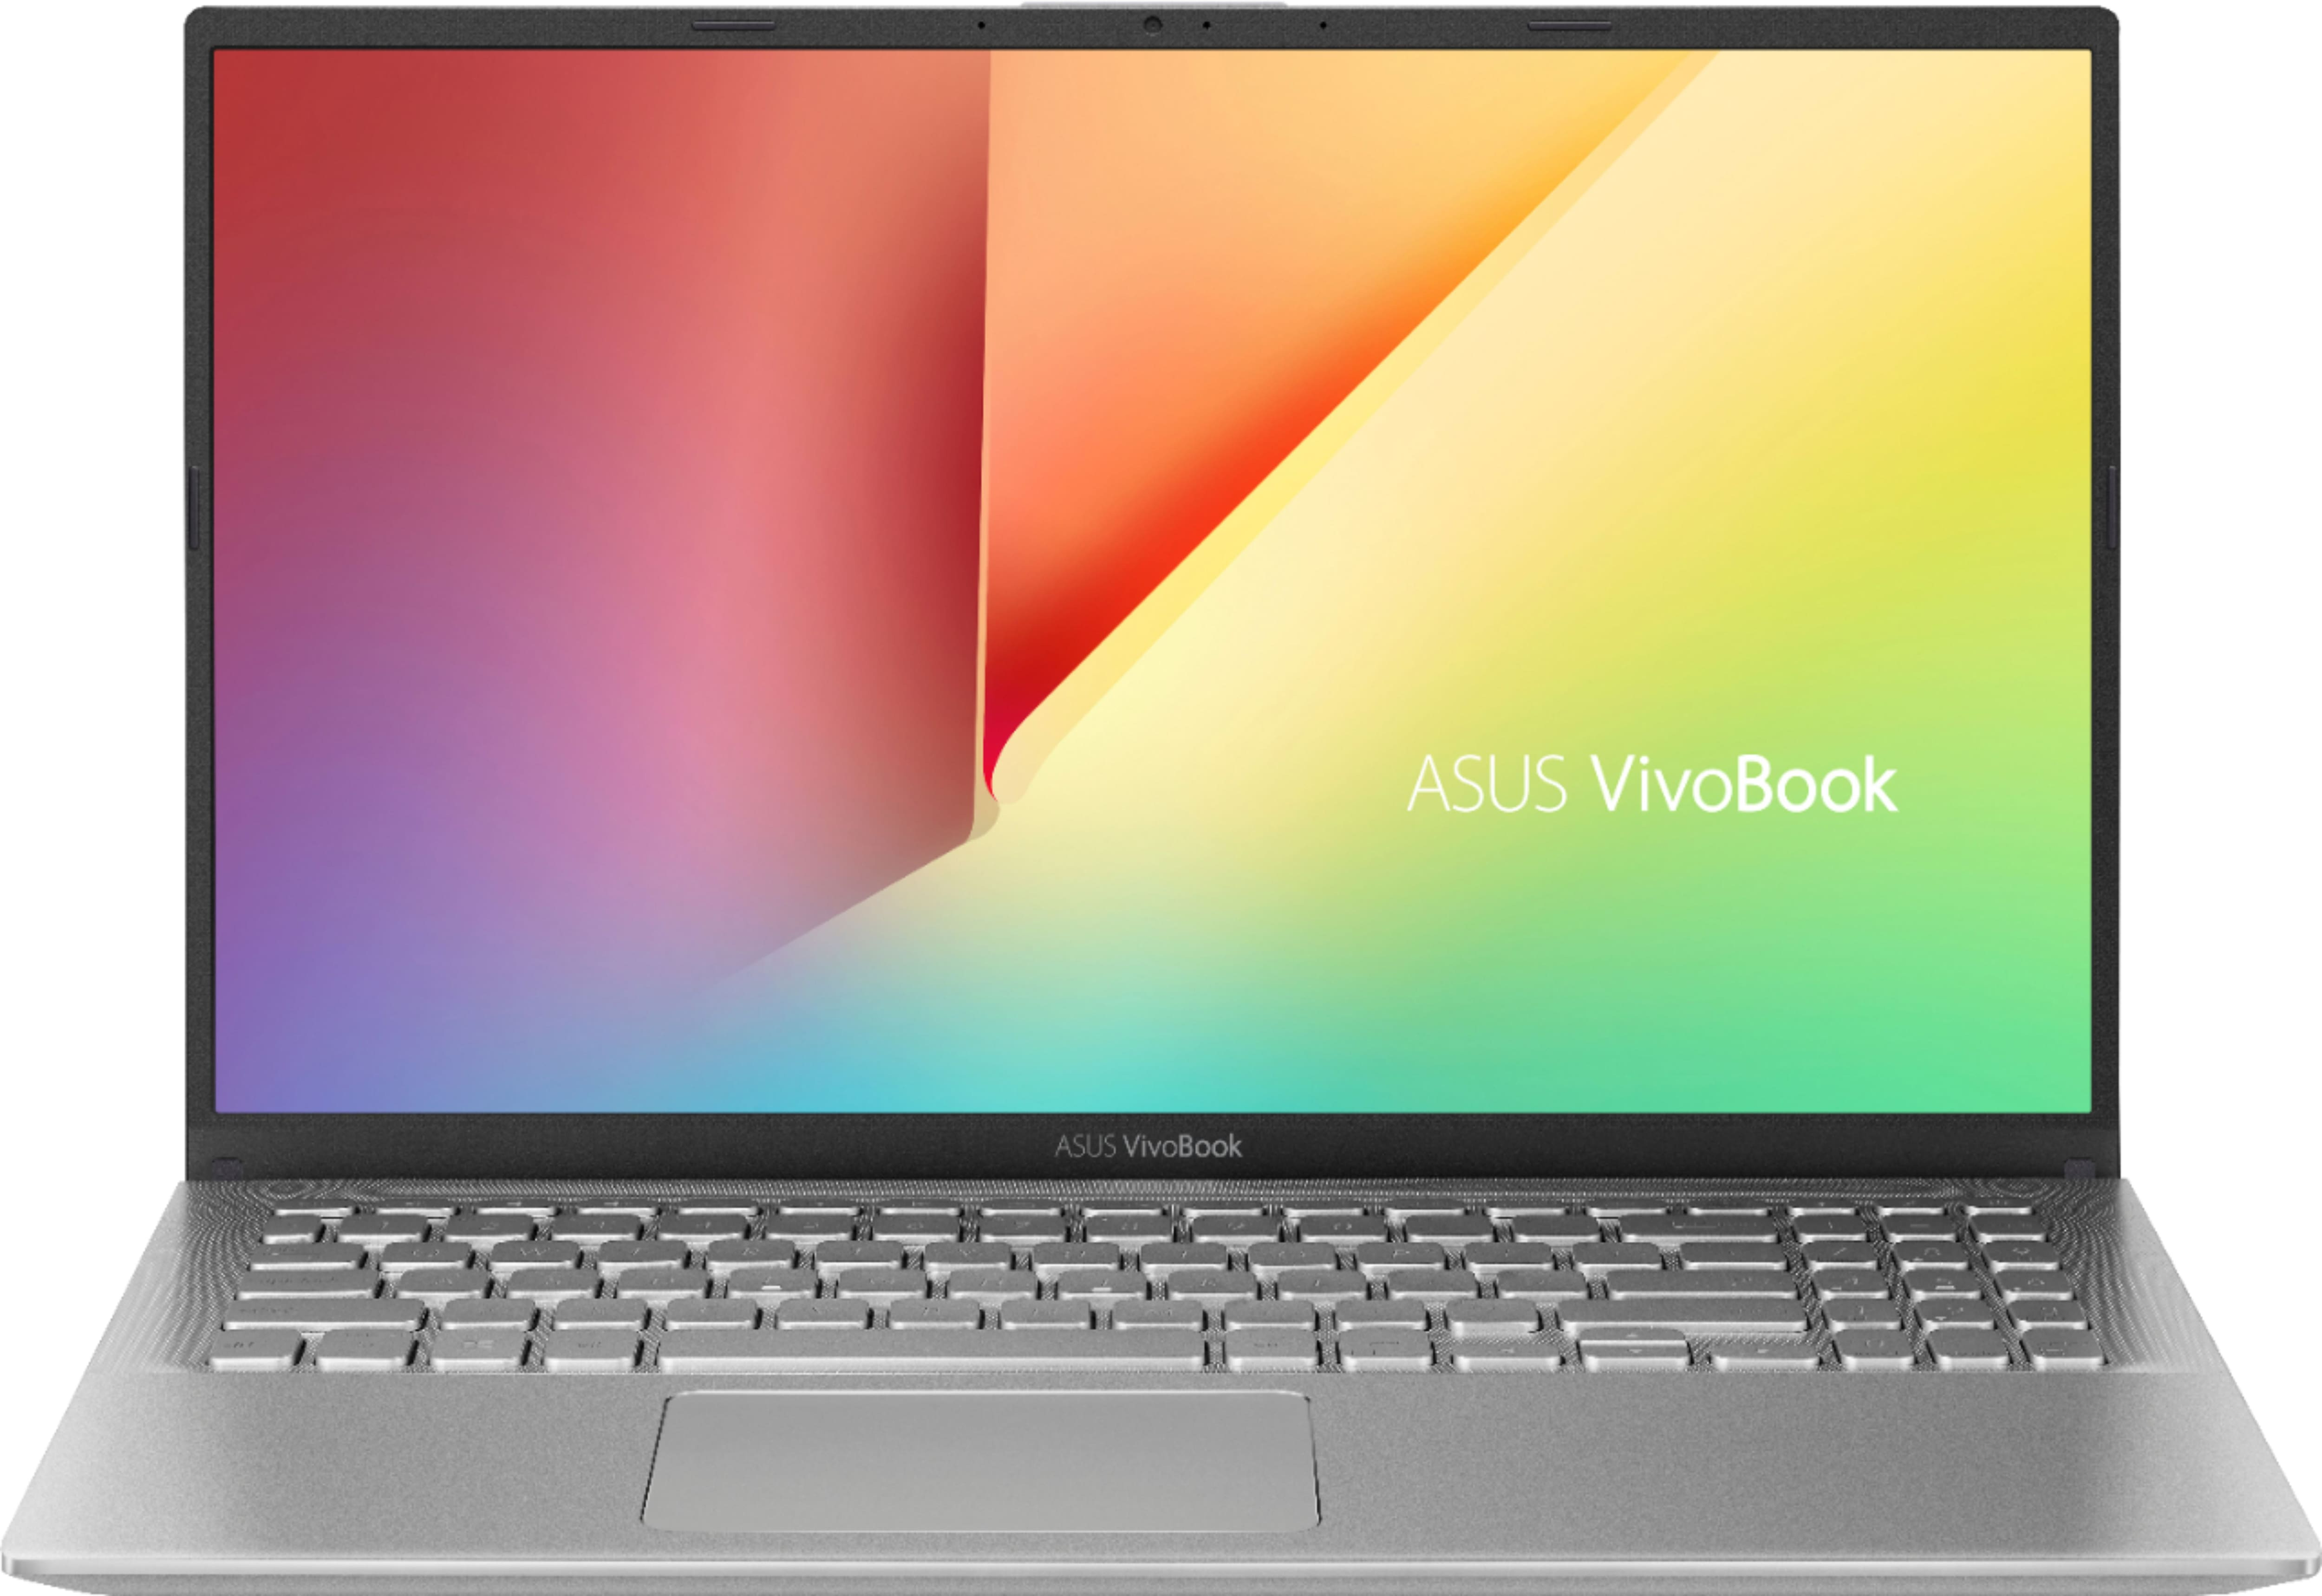 Asus Vivobook 15 X512DA: 15.6'' FHD IPS, Ryzen 7 3700U, 12GB DDR4, 512GB PCIe SSD, Win10H @ $500 + F/S